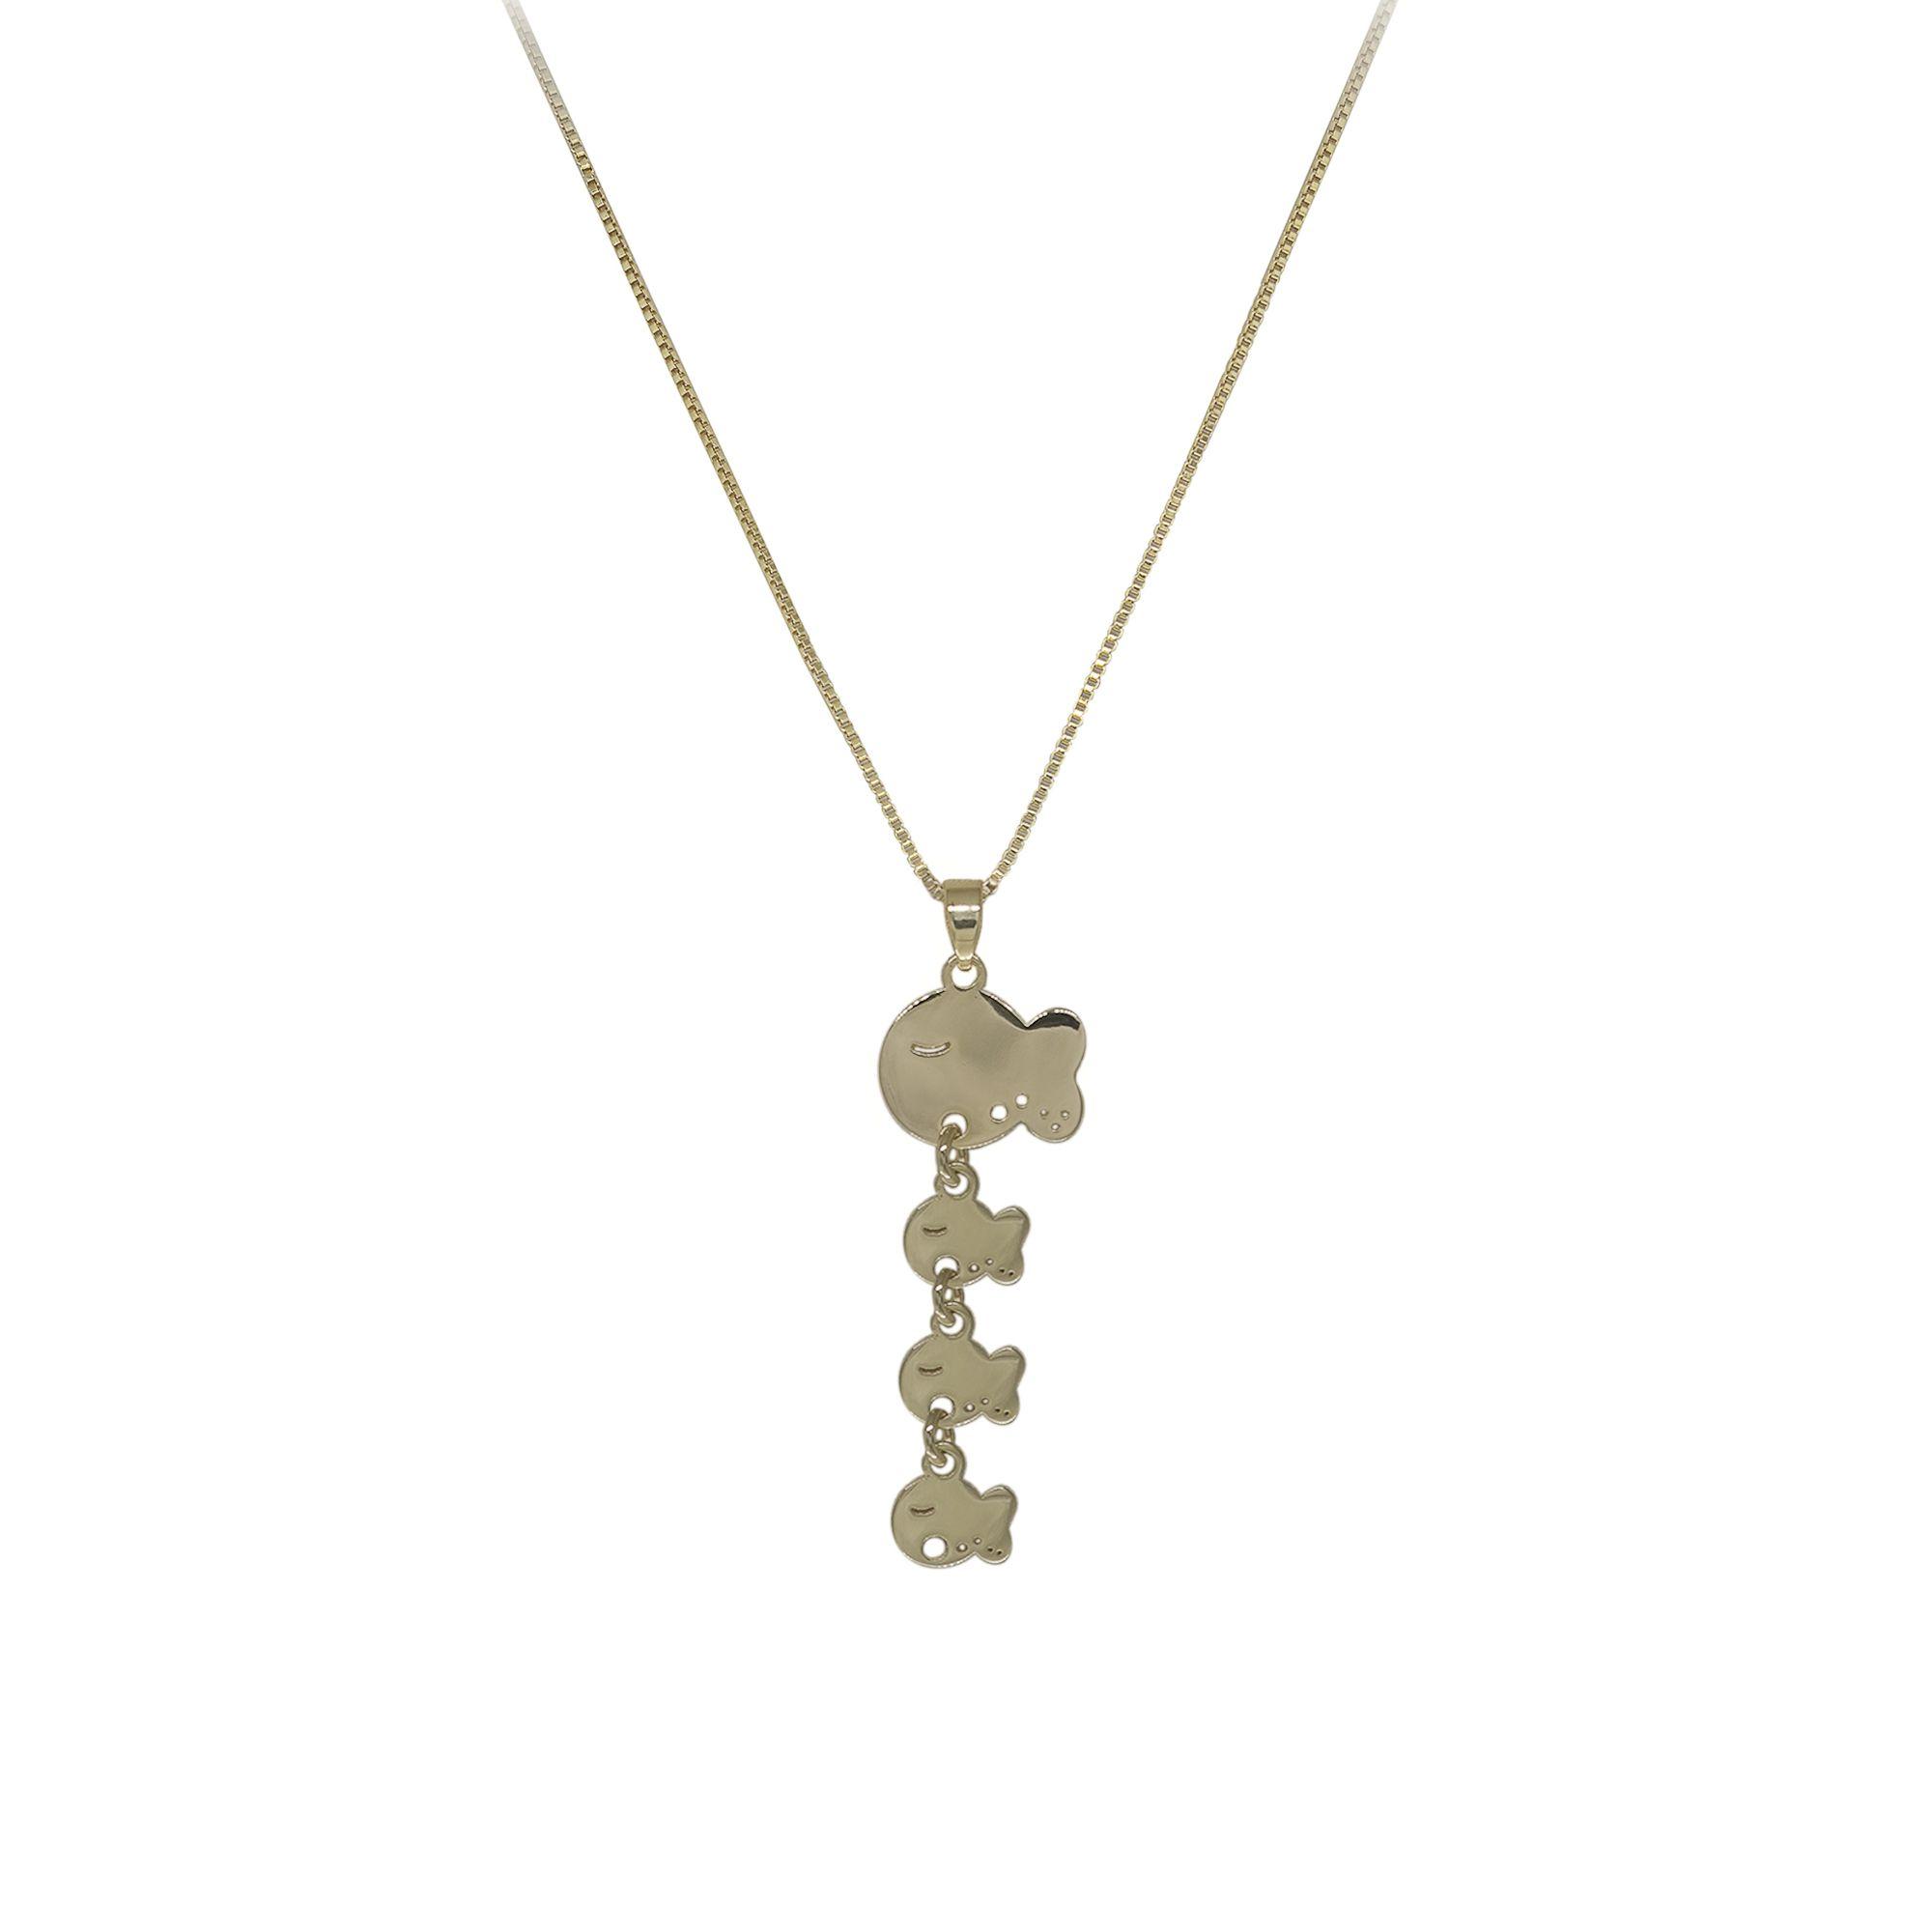 Colar Semi joia Mãe Peixinha folheado a ouro 18k ou rhodium